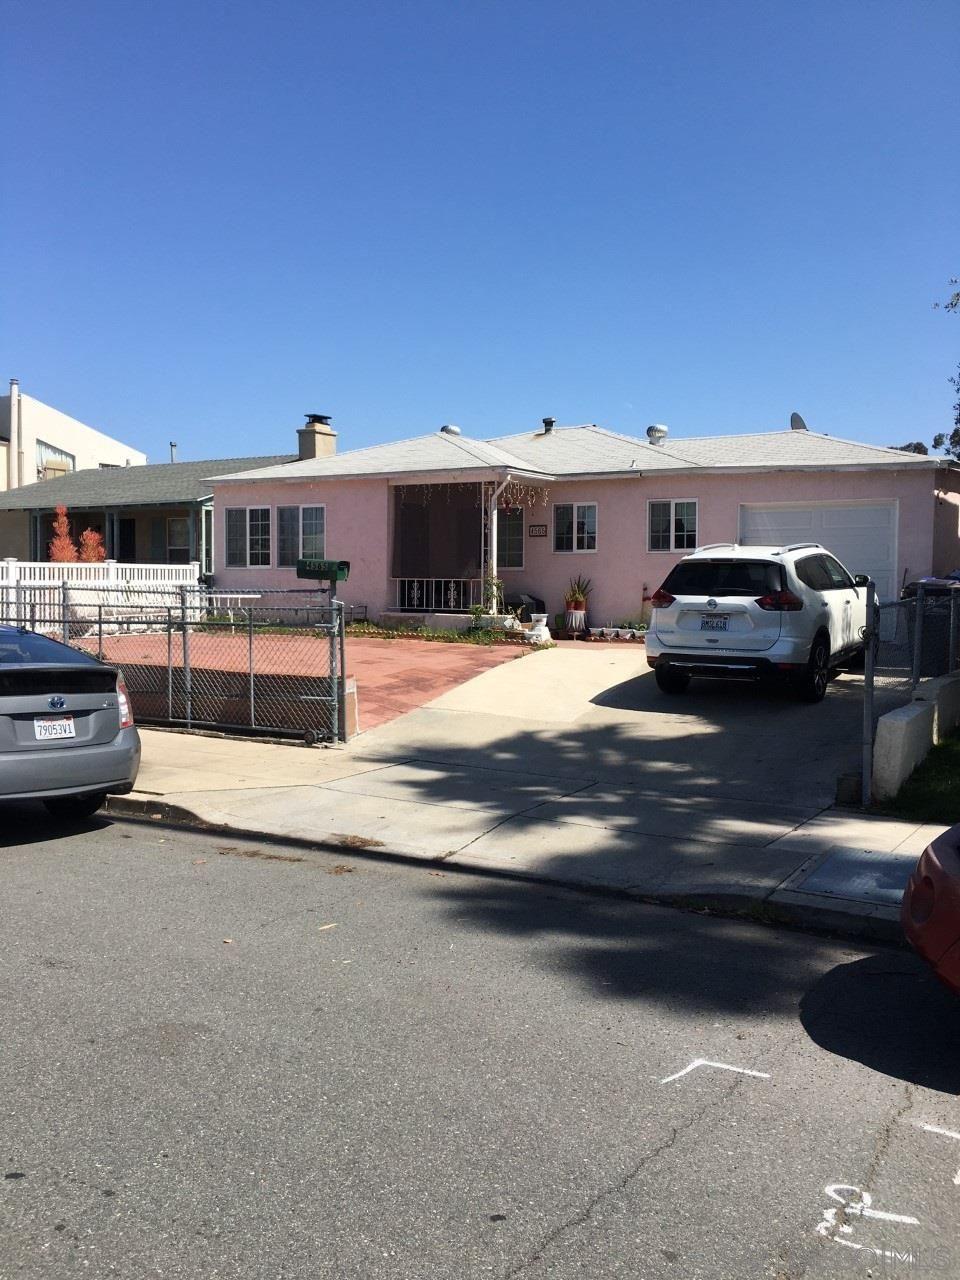 Photo of 4563 51st Street, San Diego, CA 92115 (MLS # 210008773)